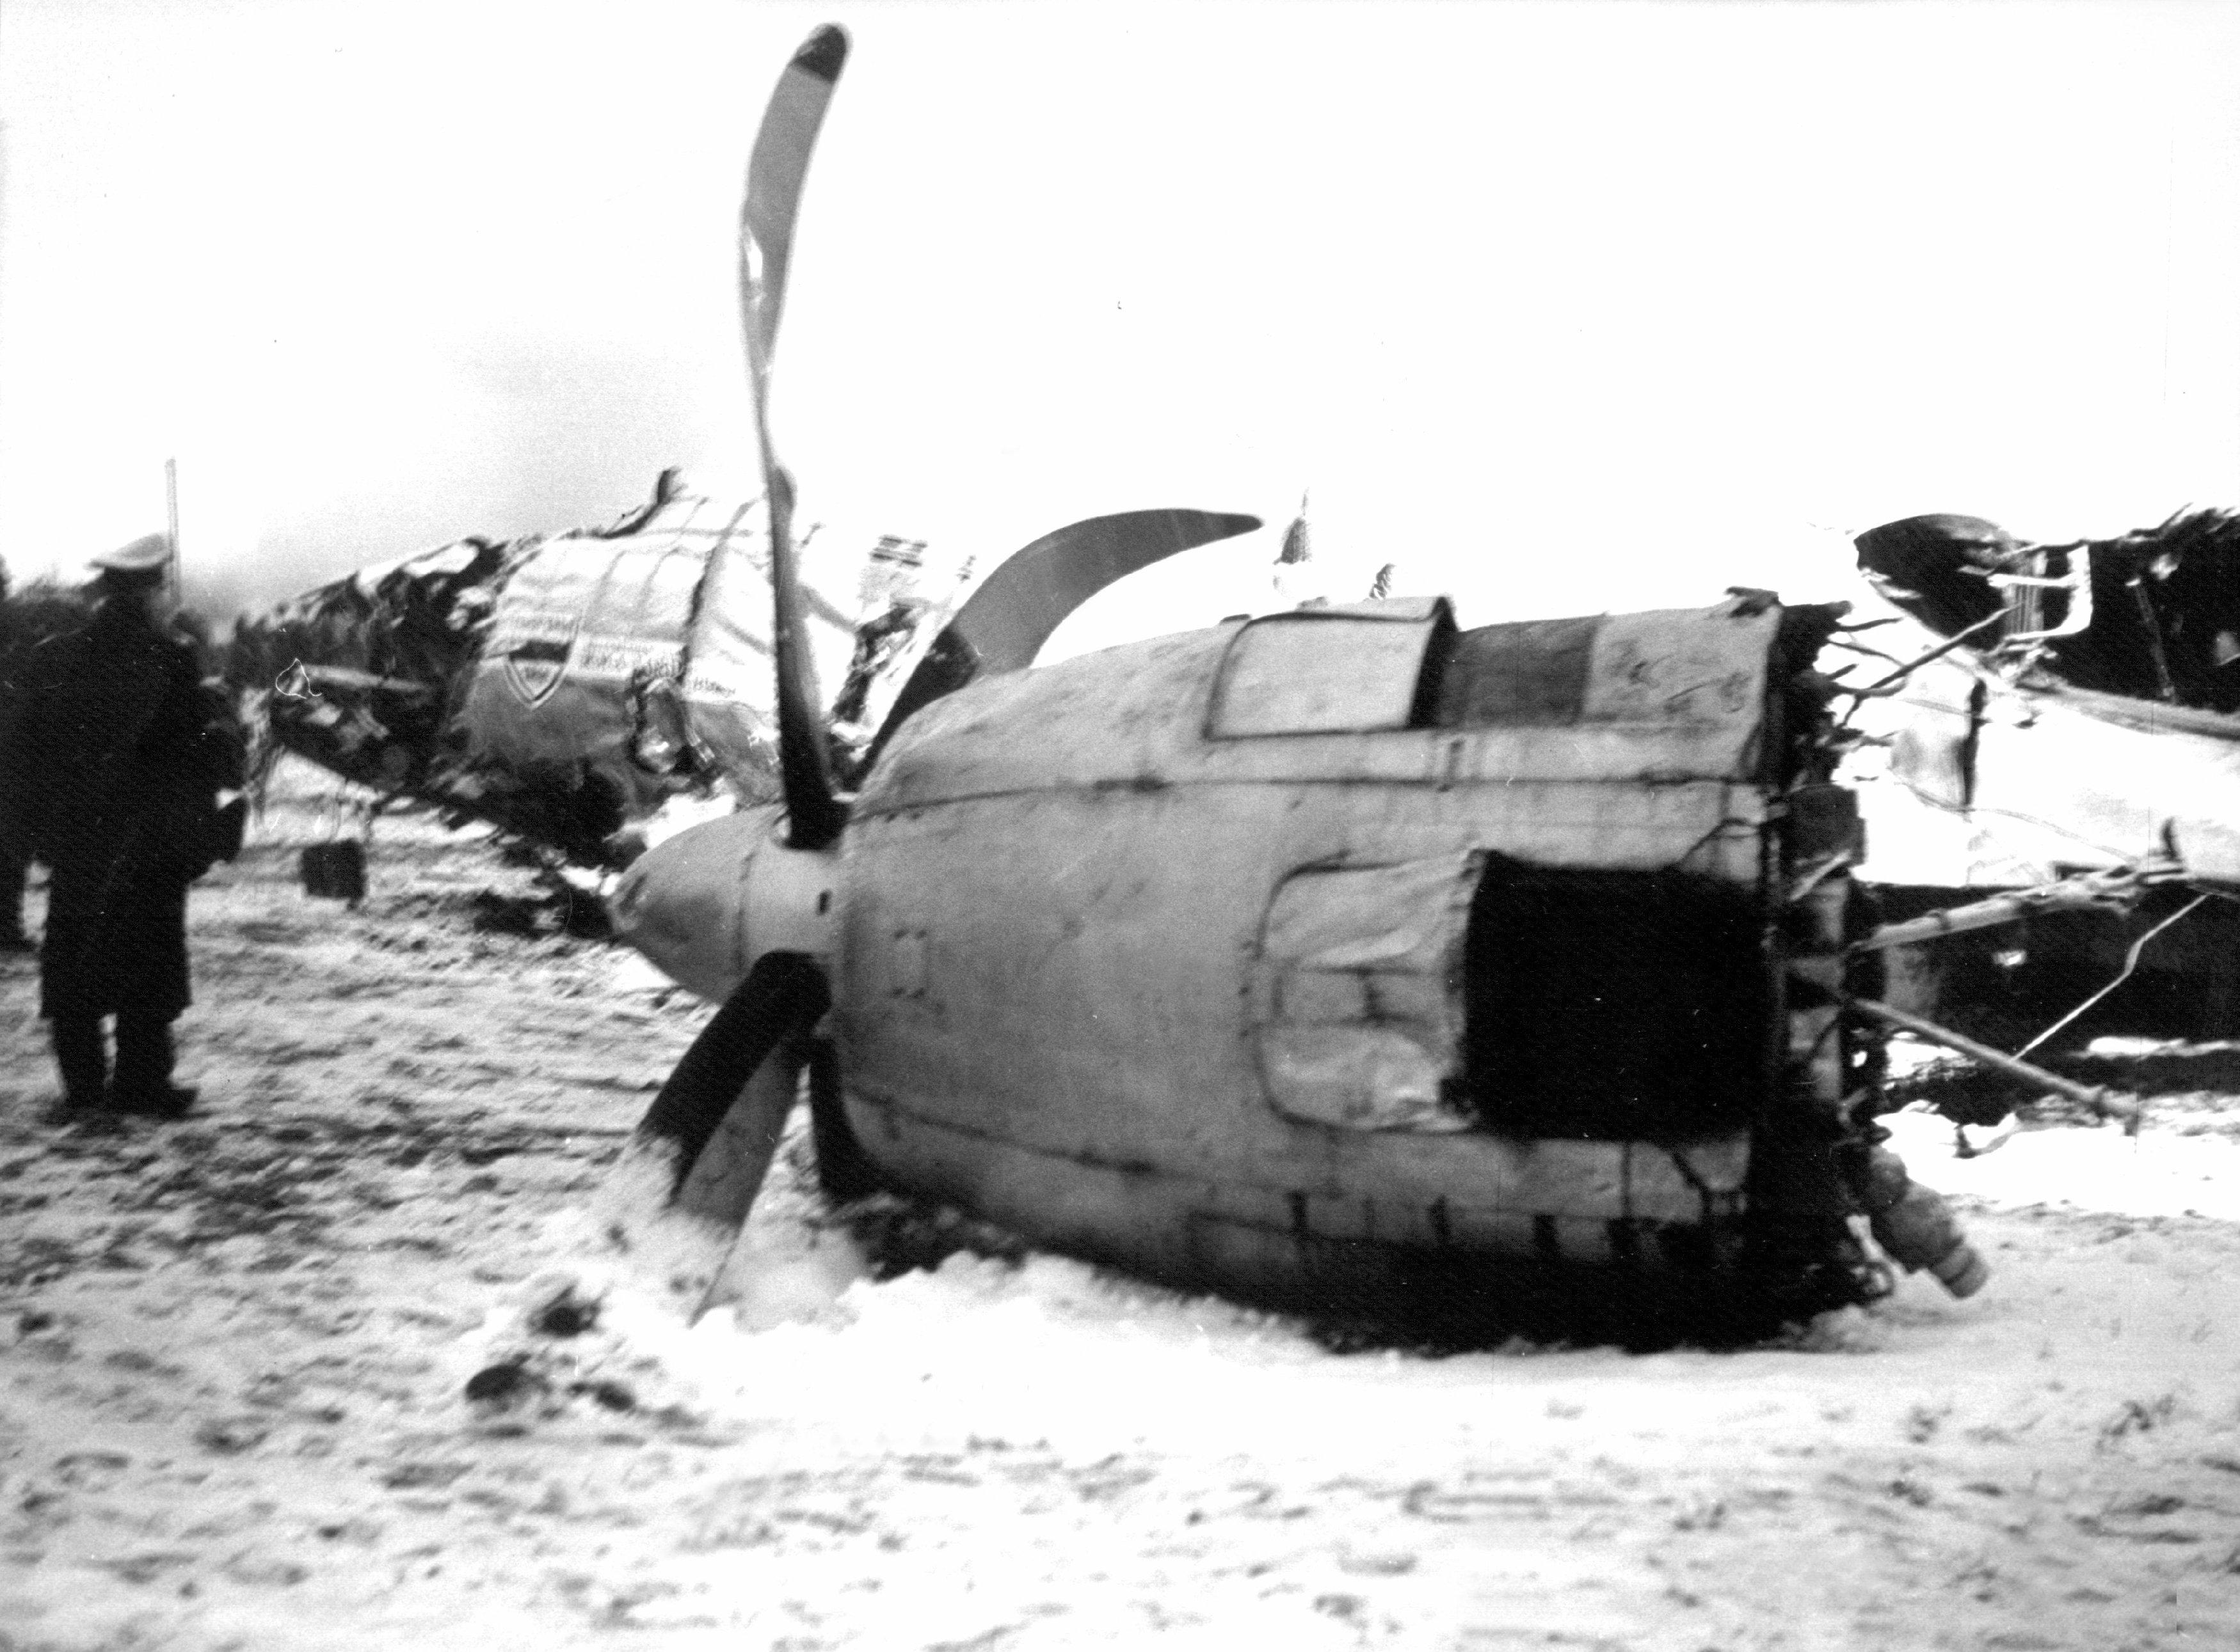 Авиакатастрофа манчестер юнайтед 1958 видео